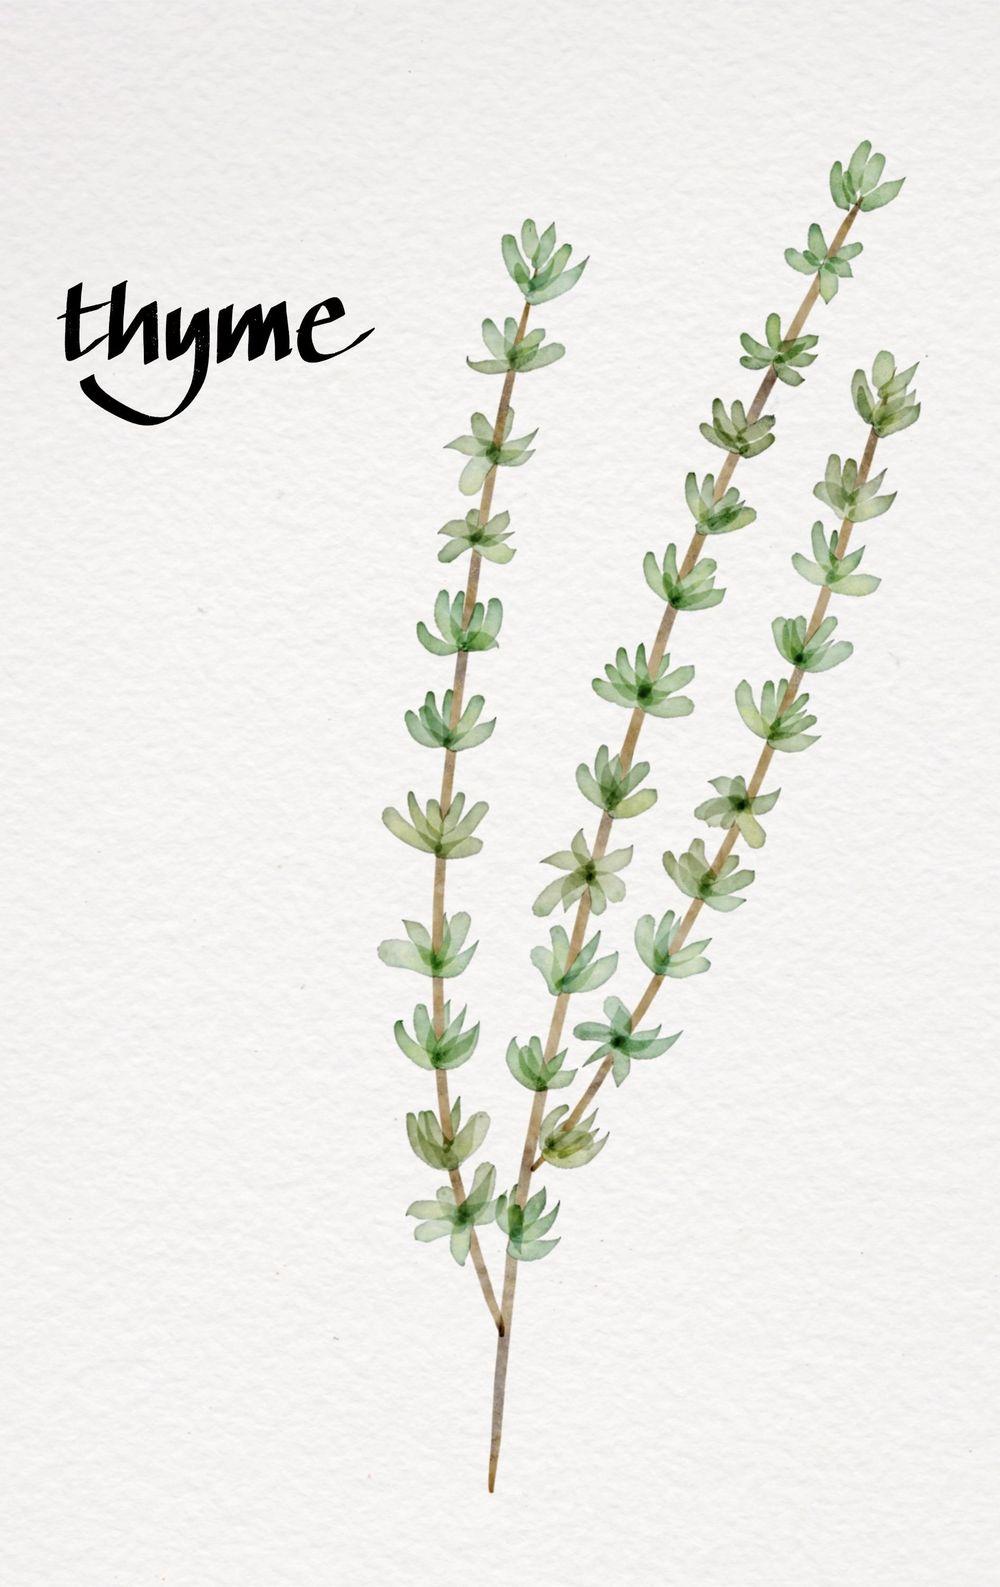 My Botanicals - image 3 - student project